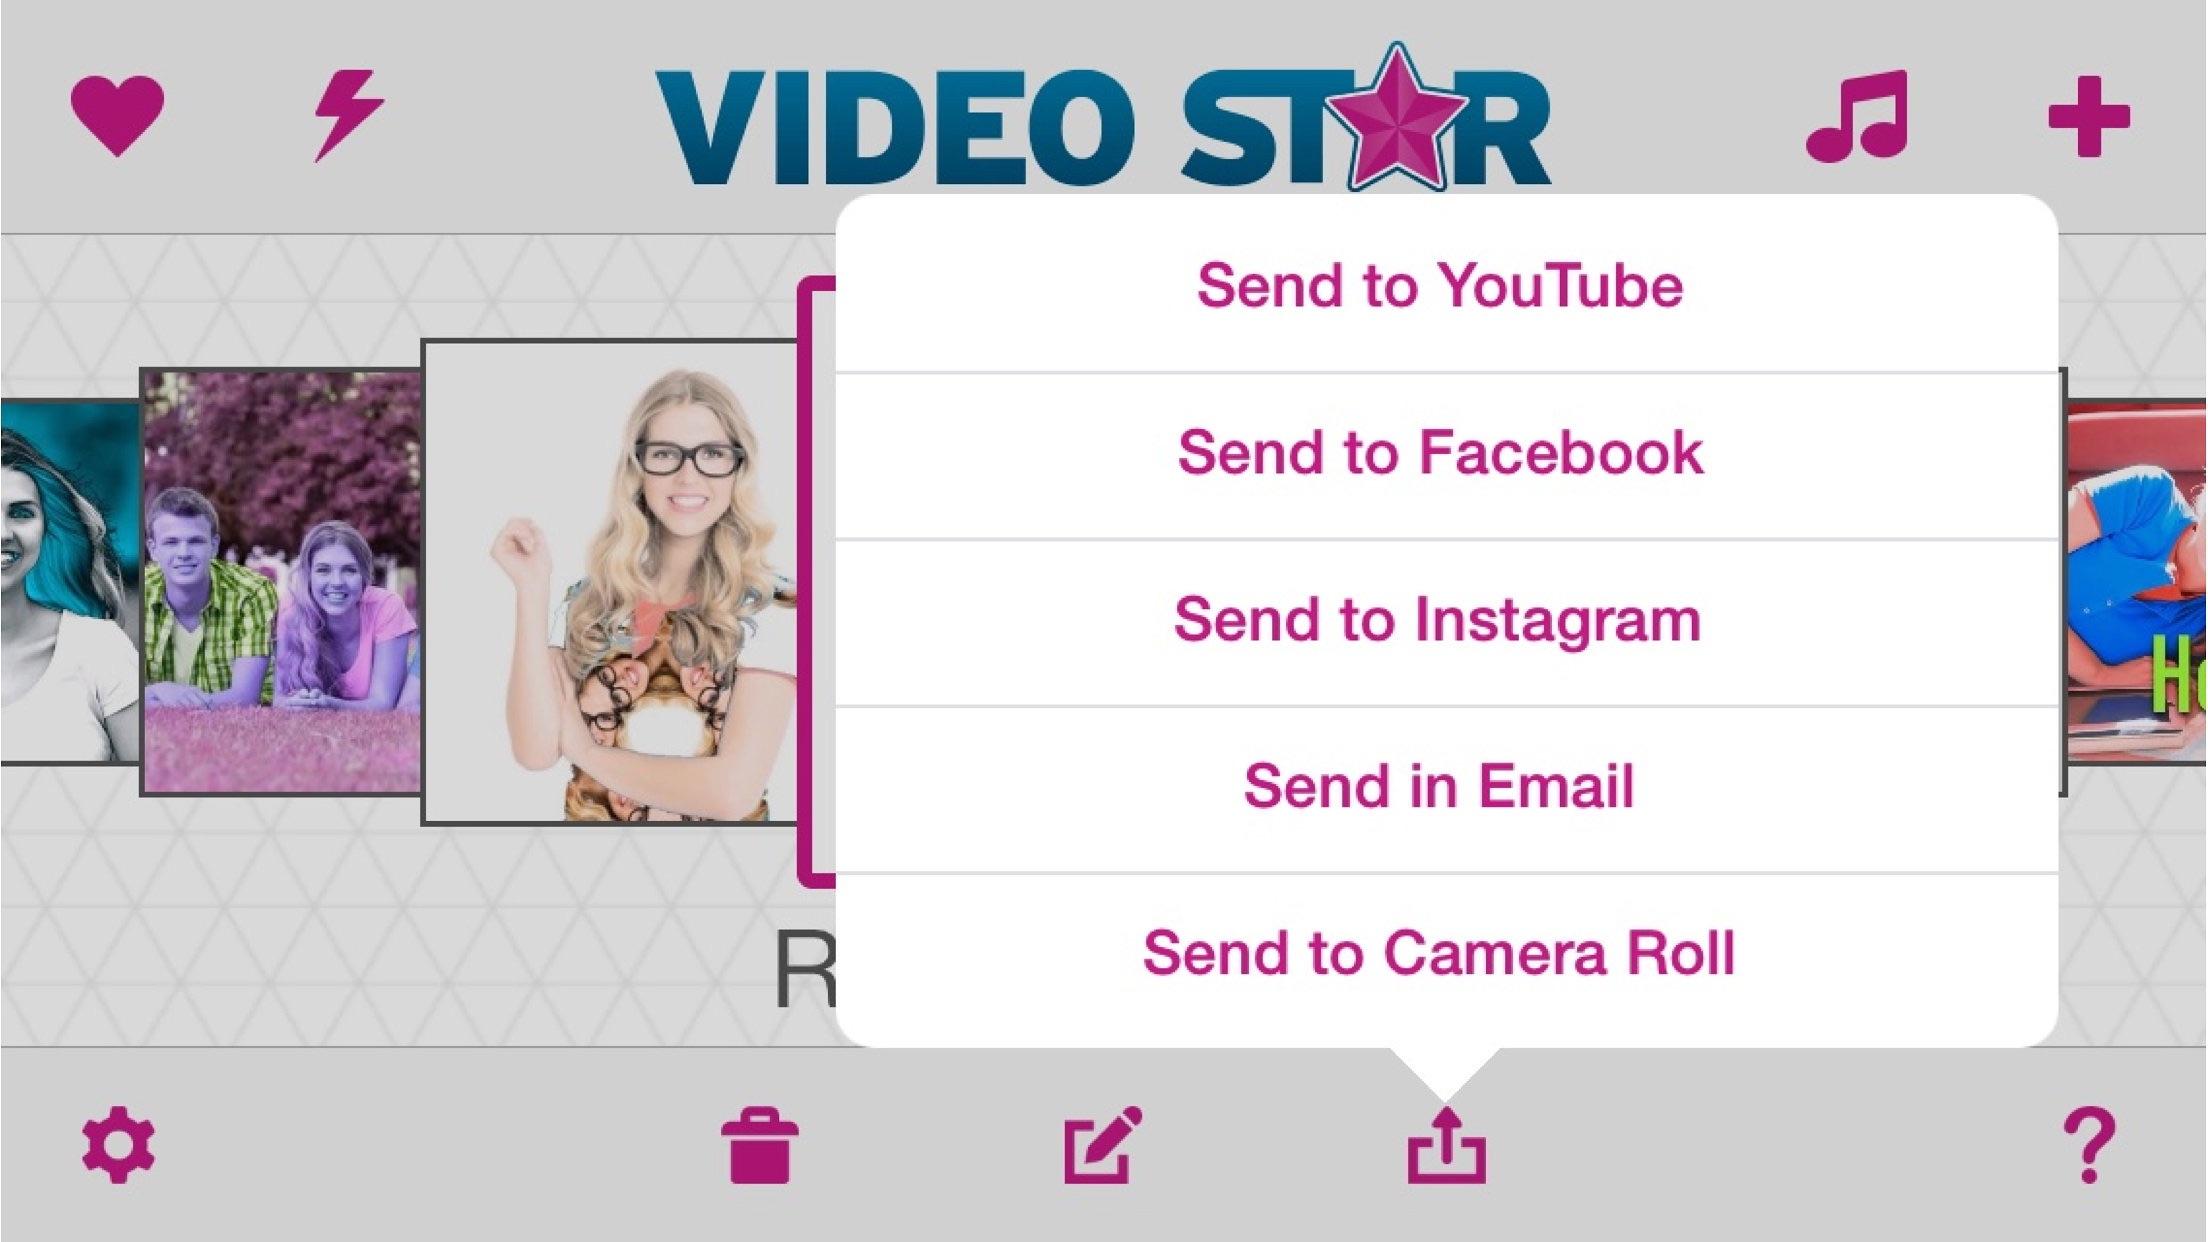 Video Star Screenshot